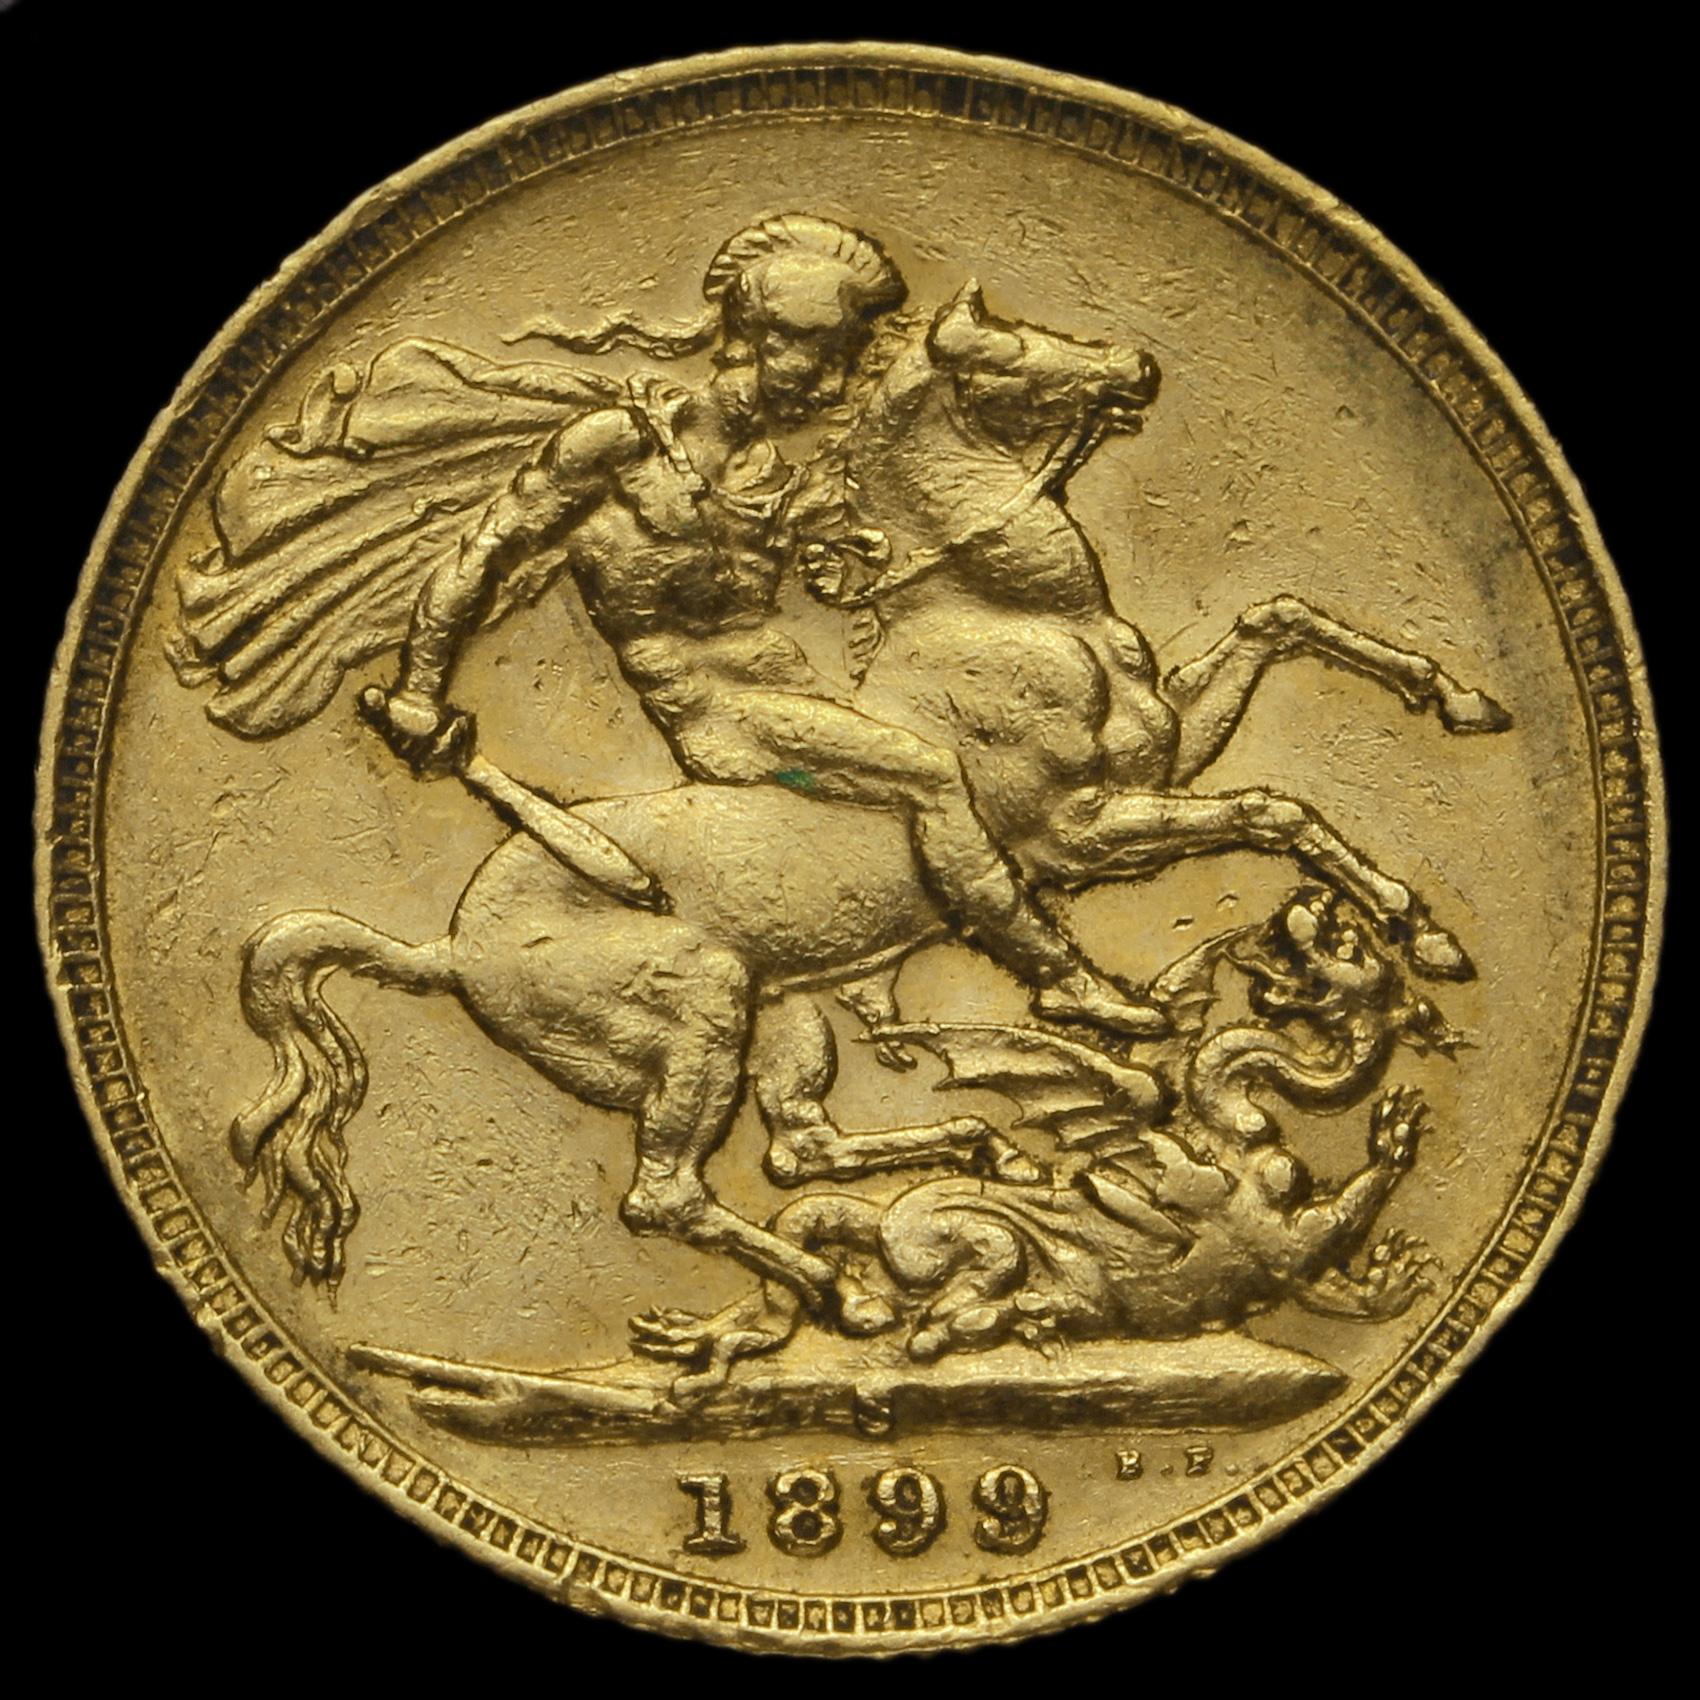 1899 Queen Victoria Veiled Head Full Sovereign, Sydney Mint